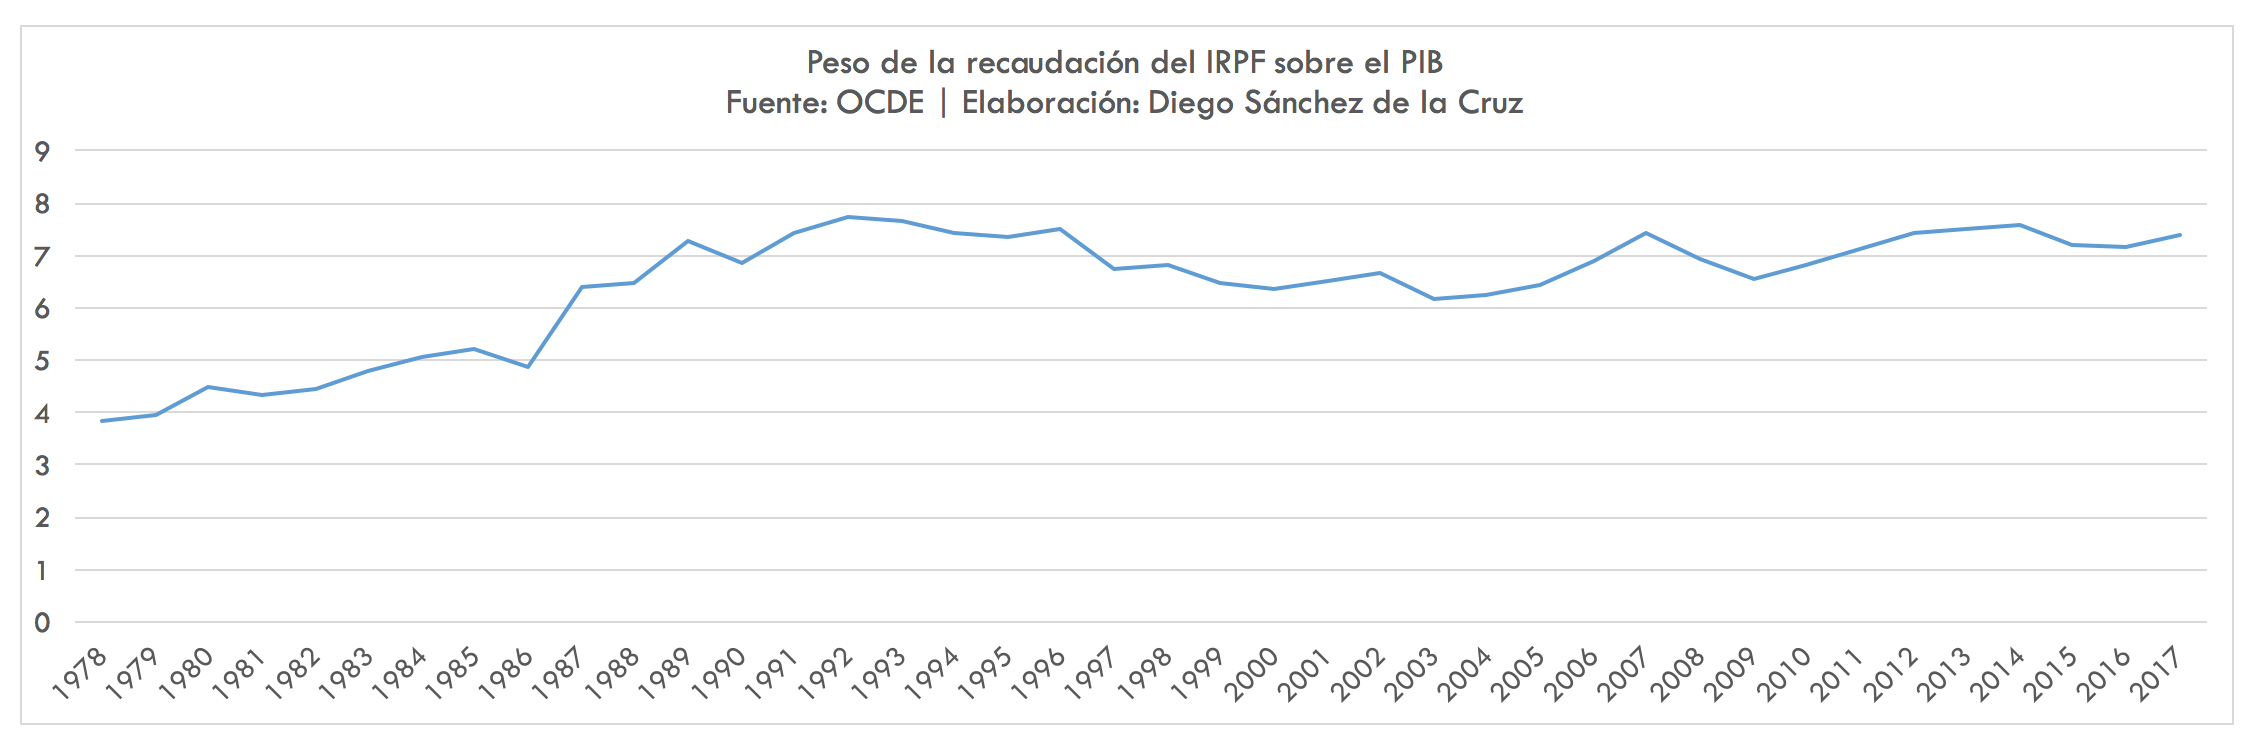 IRPF-recaudacion-pib.png